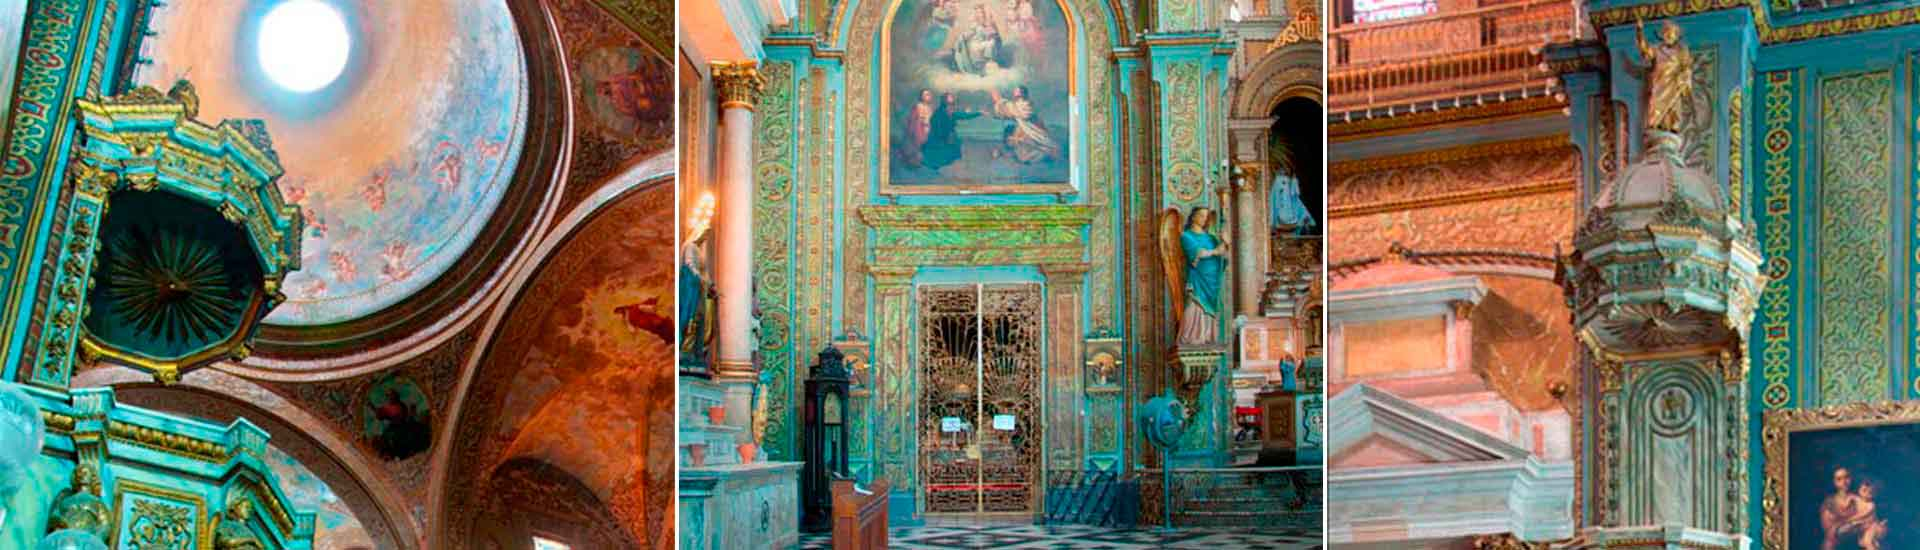 Iglesias de la calle Cuba (Fotosafari)